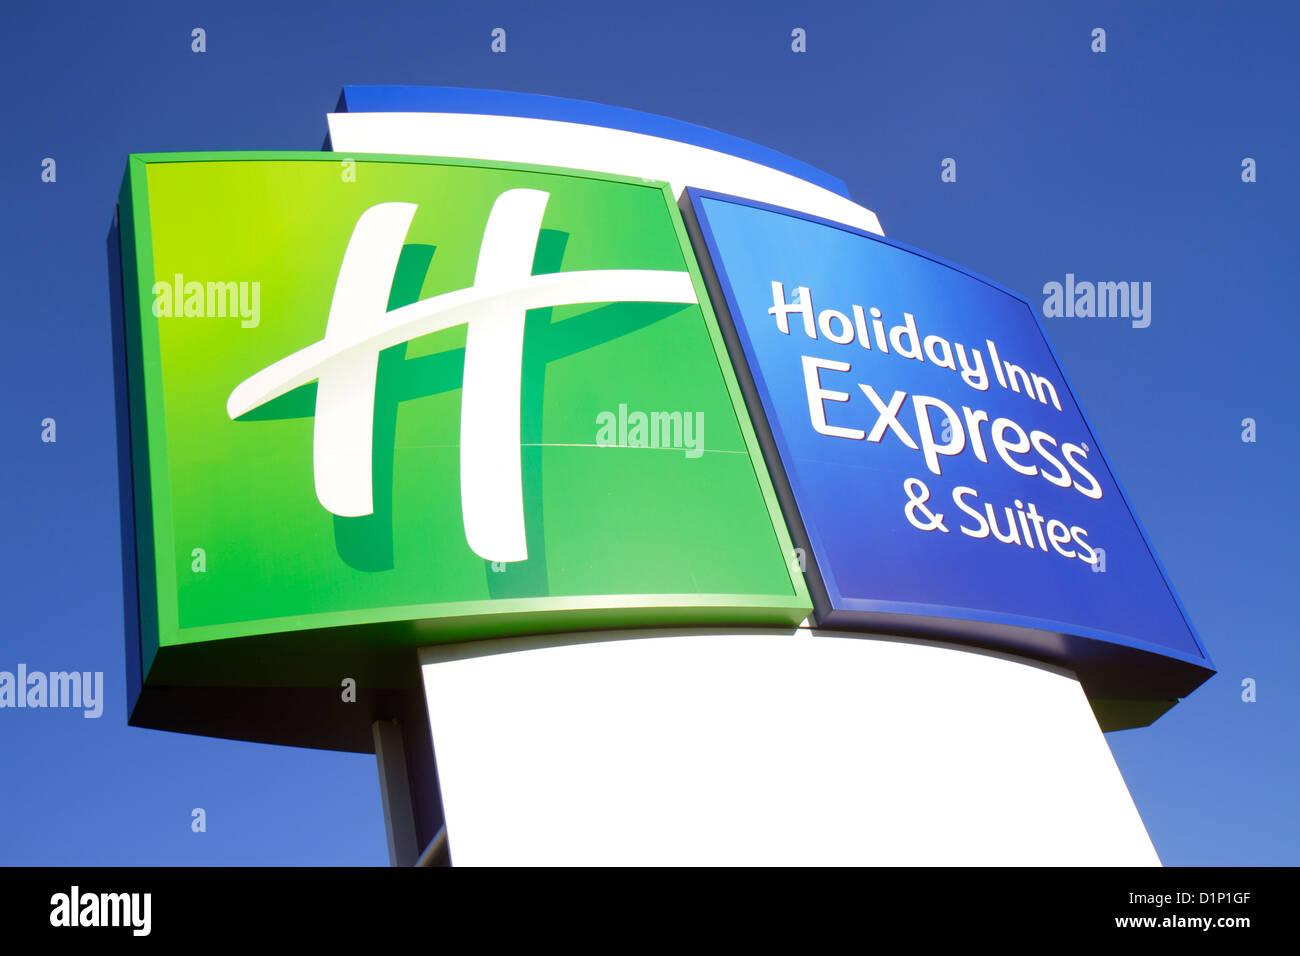 Hotel Hotels Lodging Inn Motel Motels Stock Photos & Hotel Hotels ...